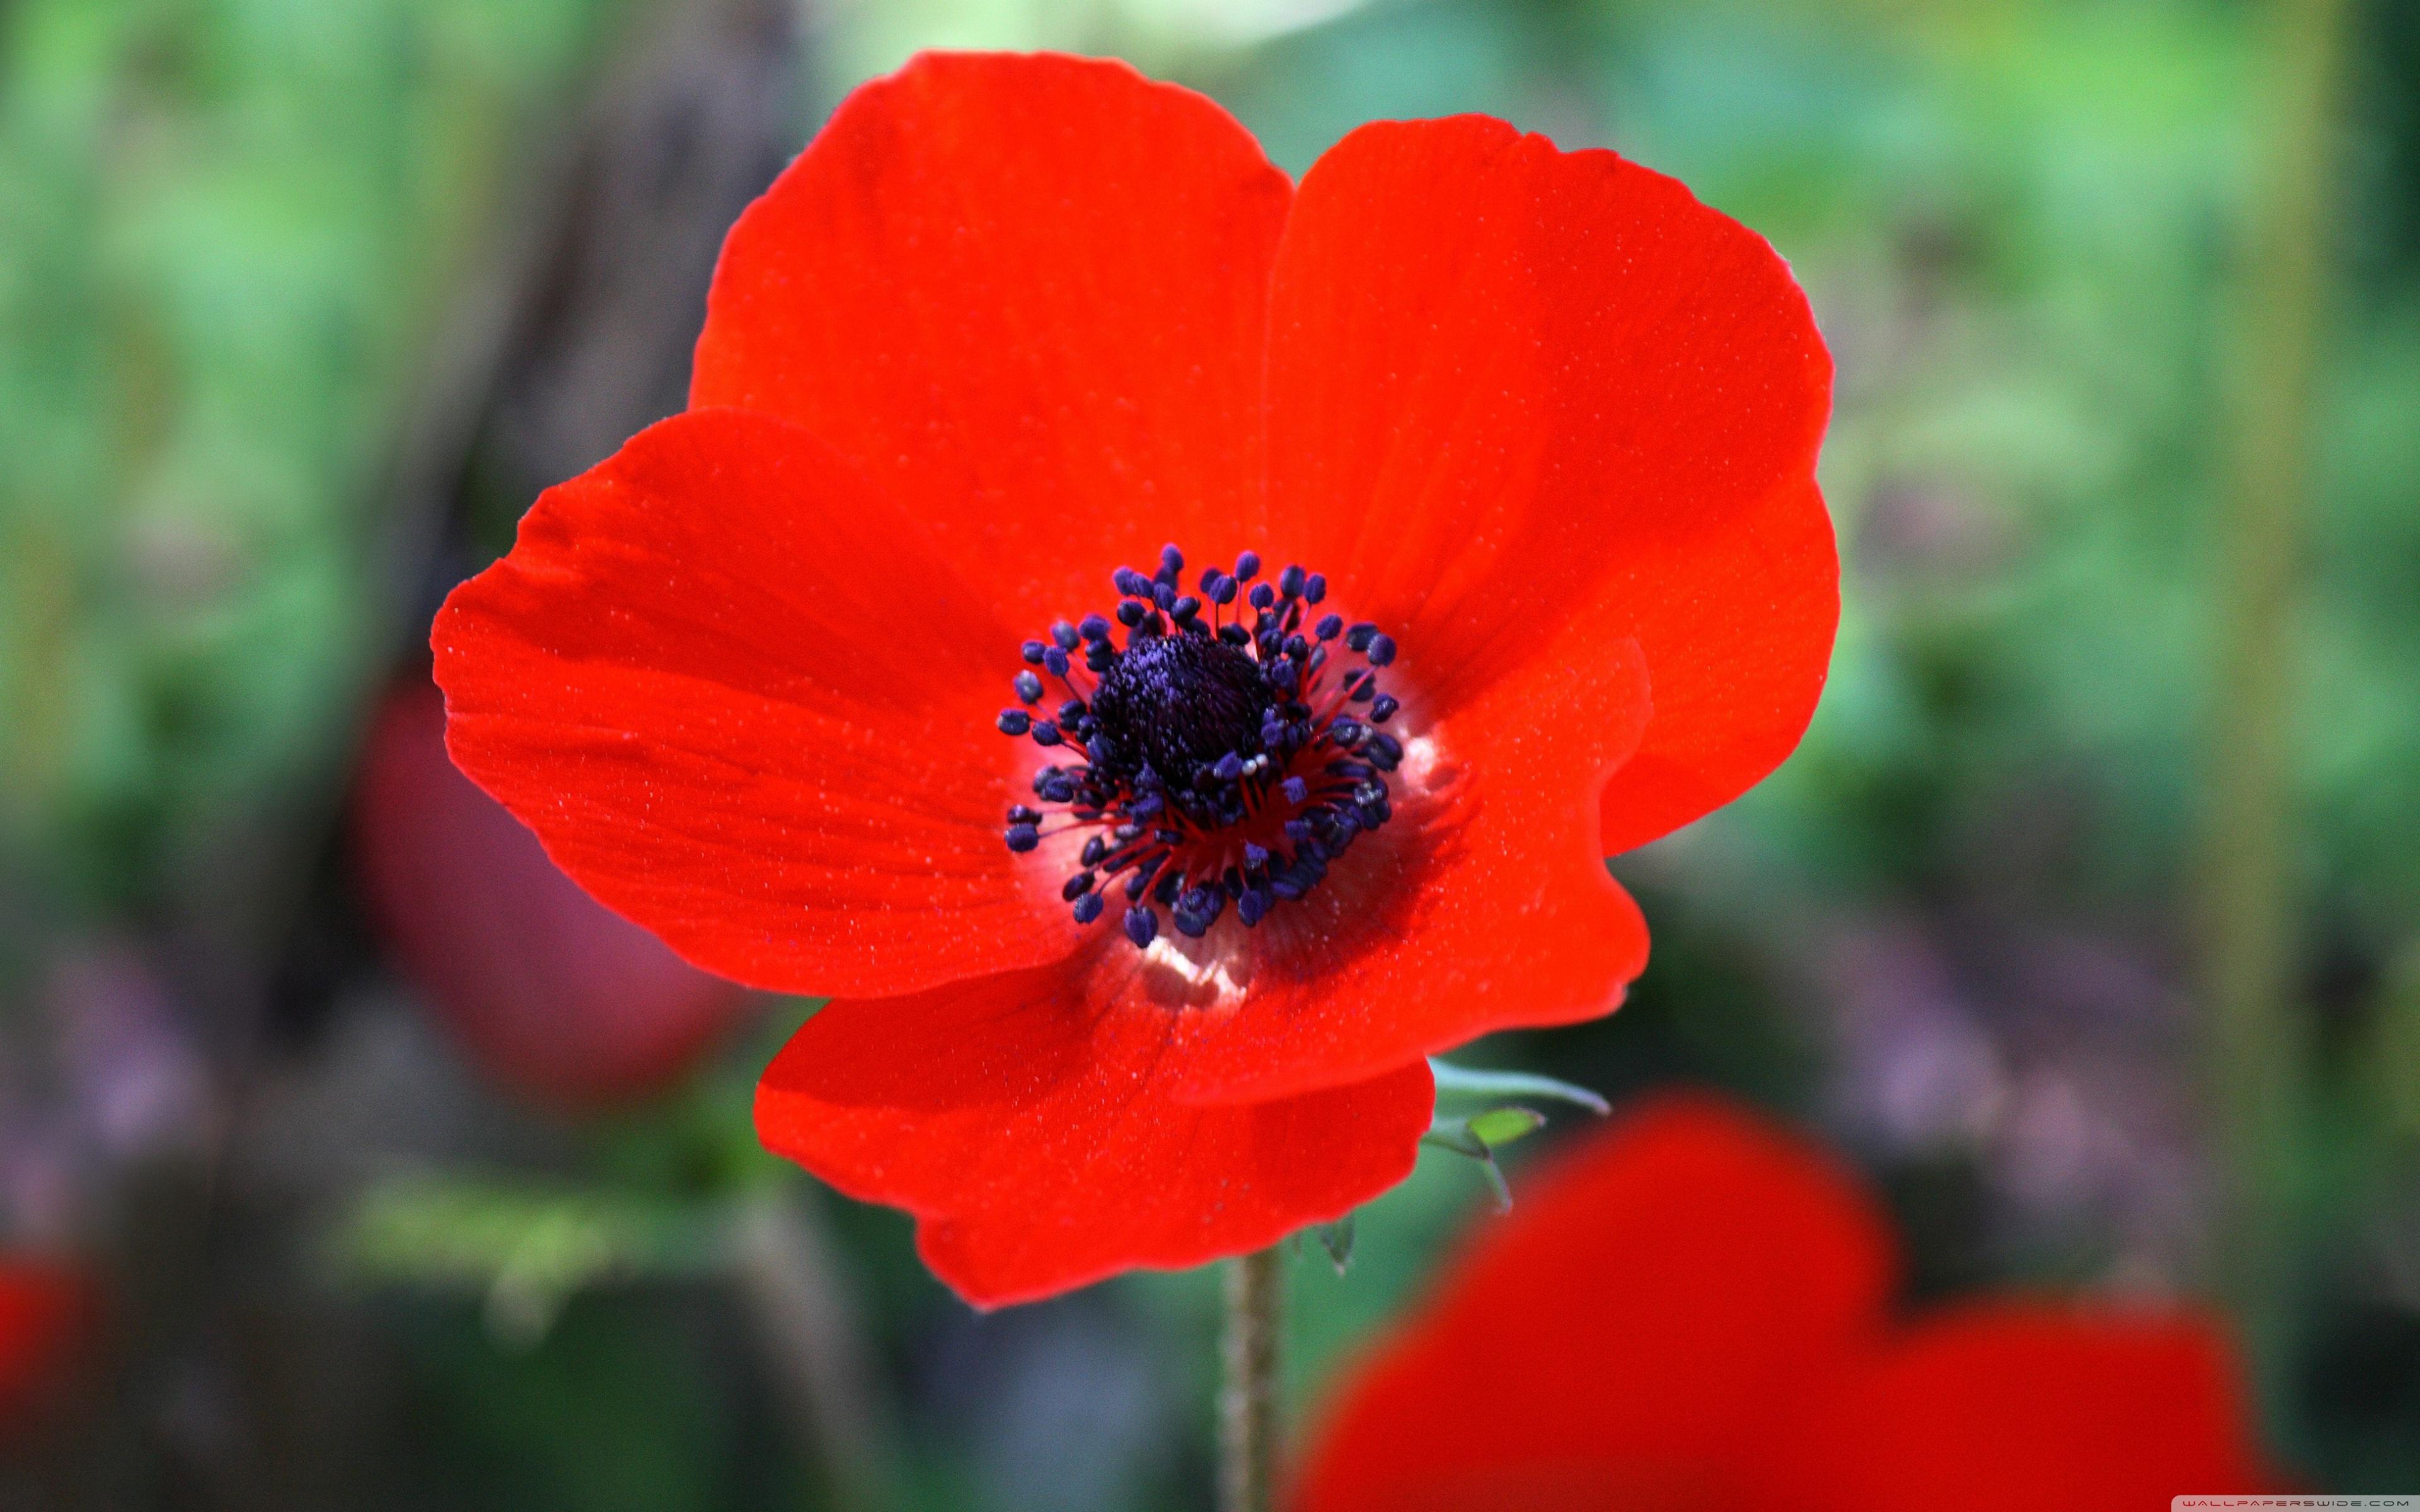 Red anemone flower photo